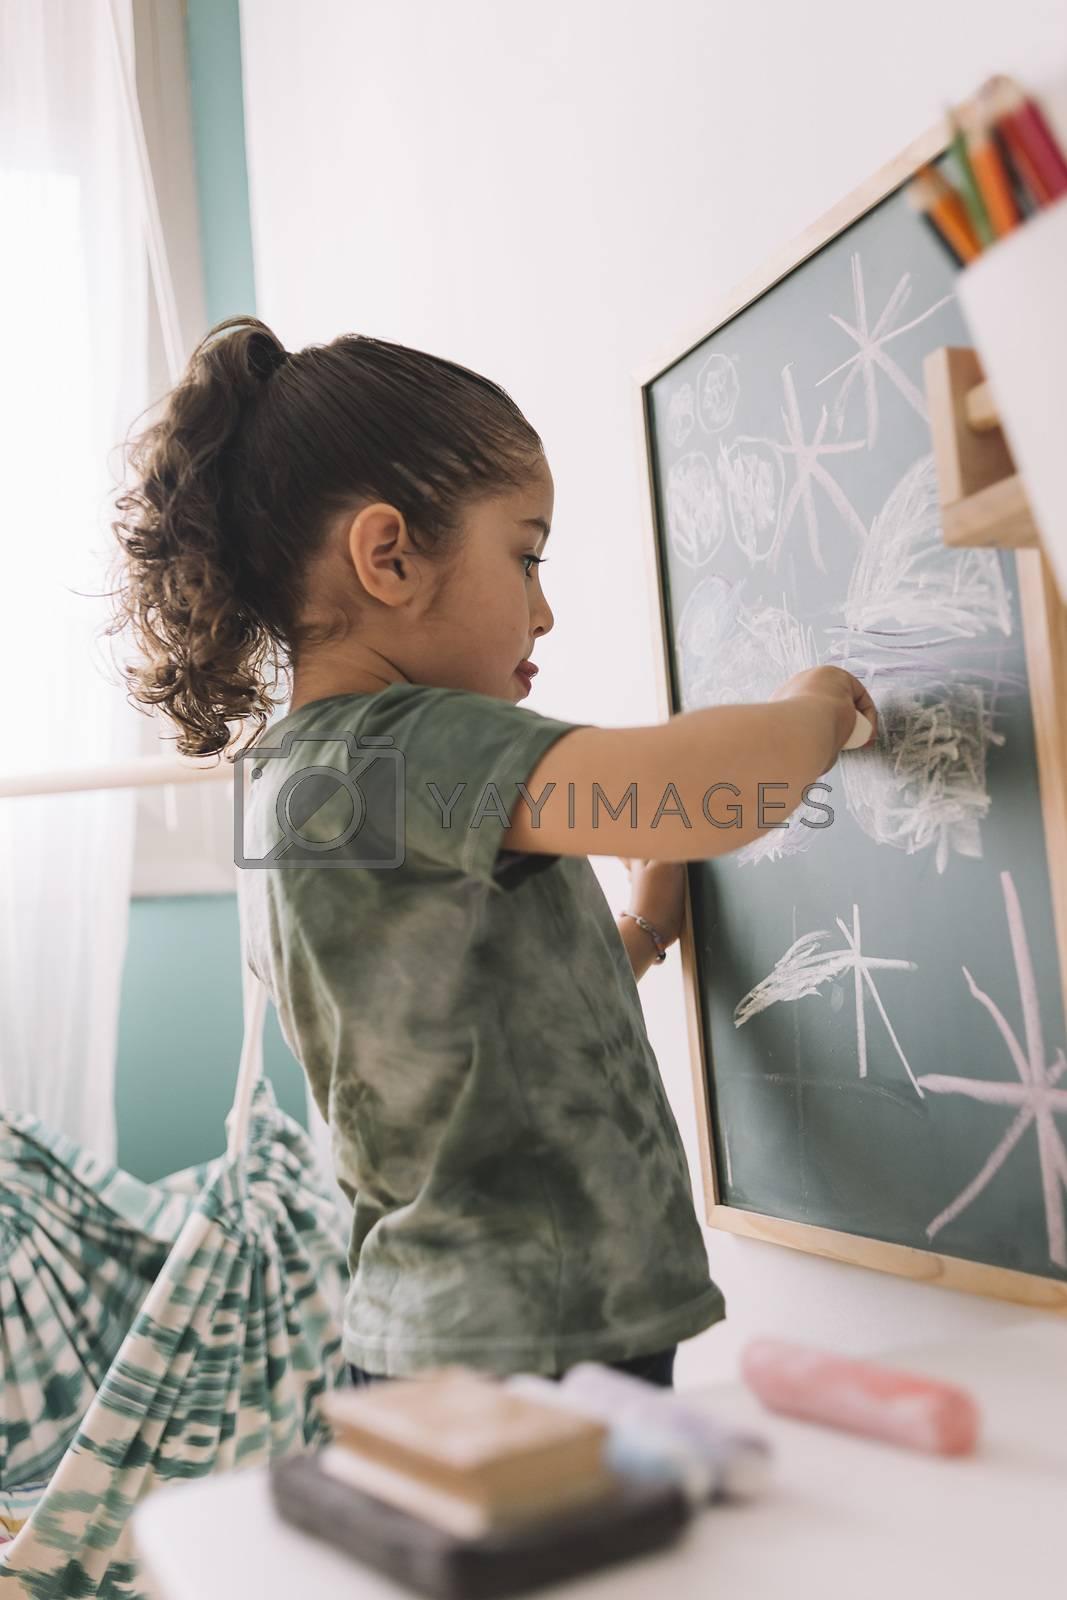 little girl drawing focused on the chalkboard by raulmellado